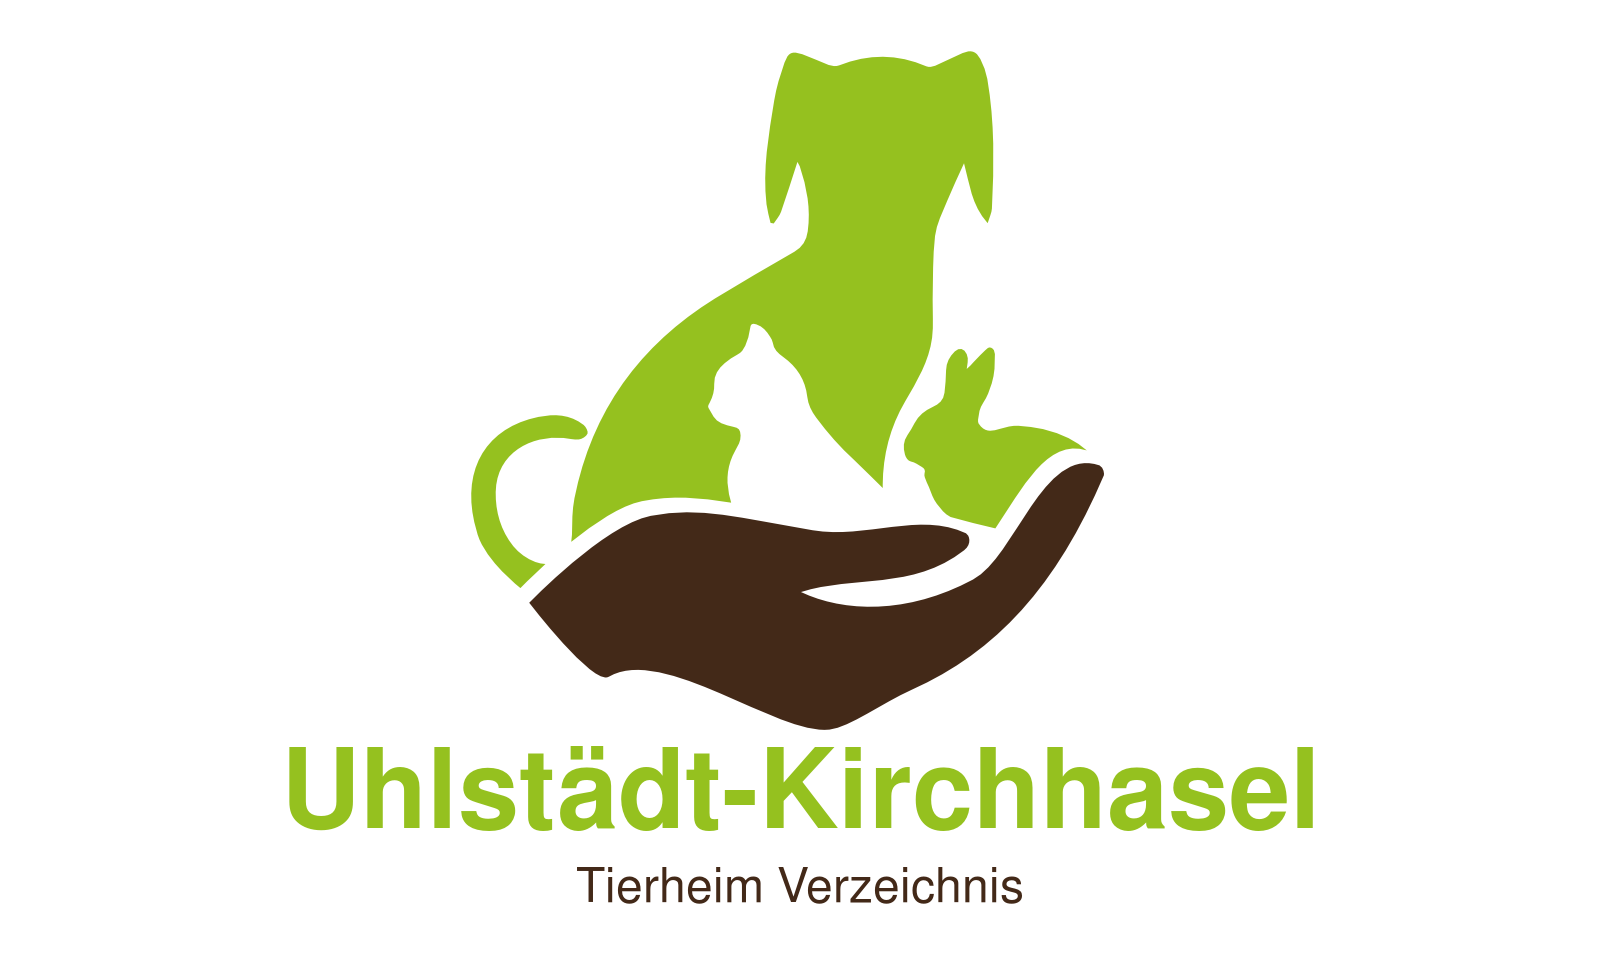 Tierheim Uhlstädt-Kirchhasel